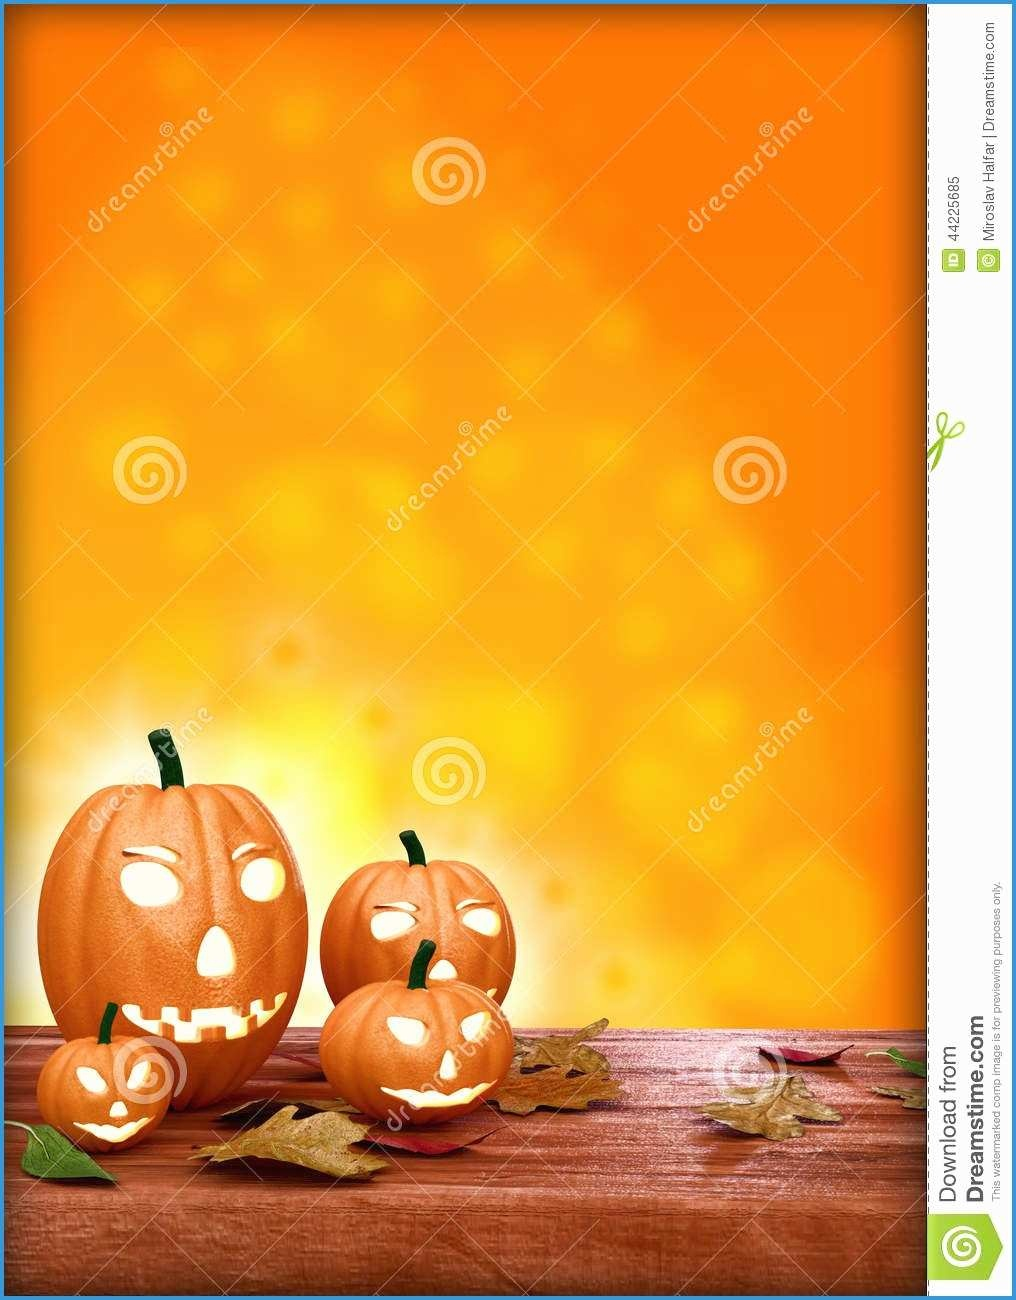 Best Ideas Of Halloween Flyer Template Free | Template - Free Printable Halloween Flyer Templates